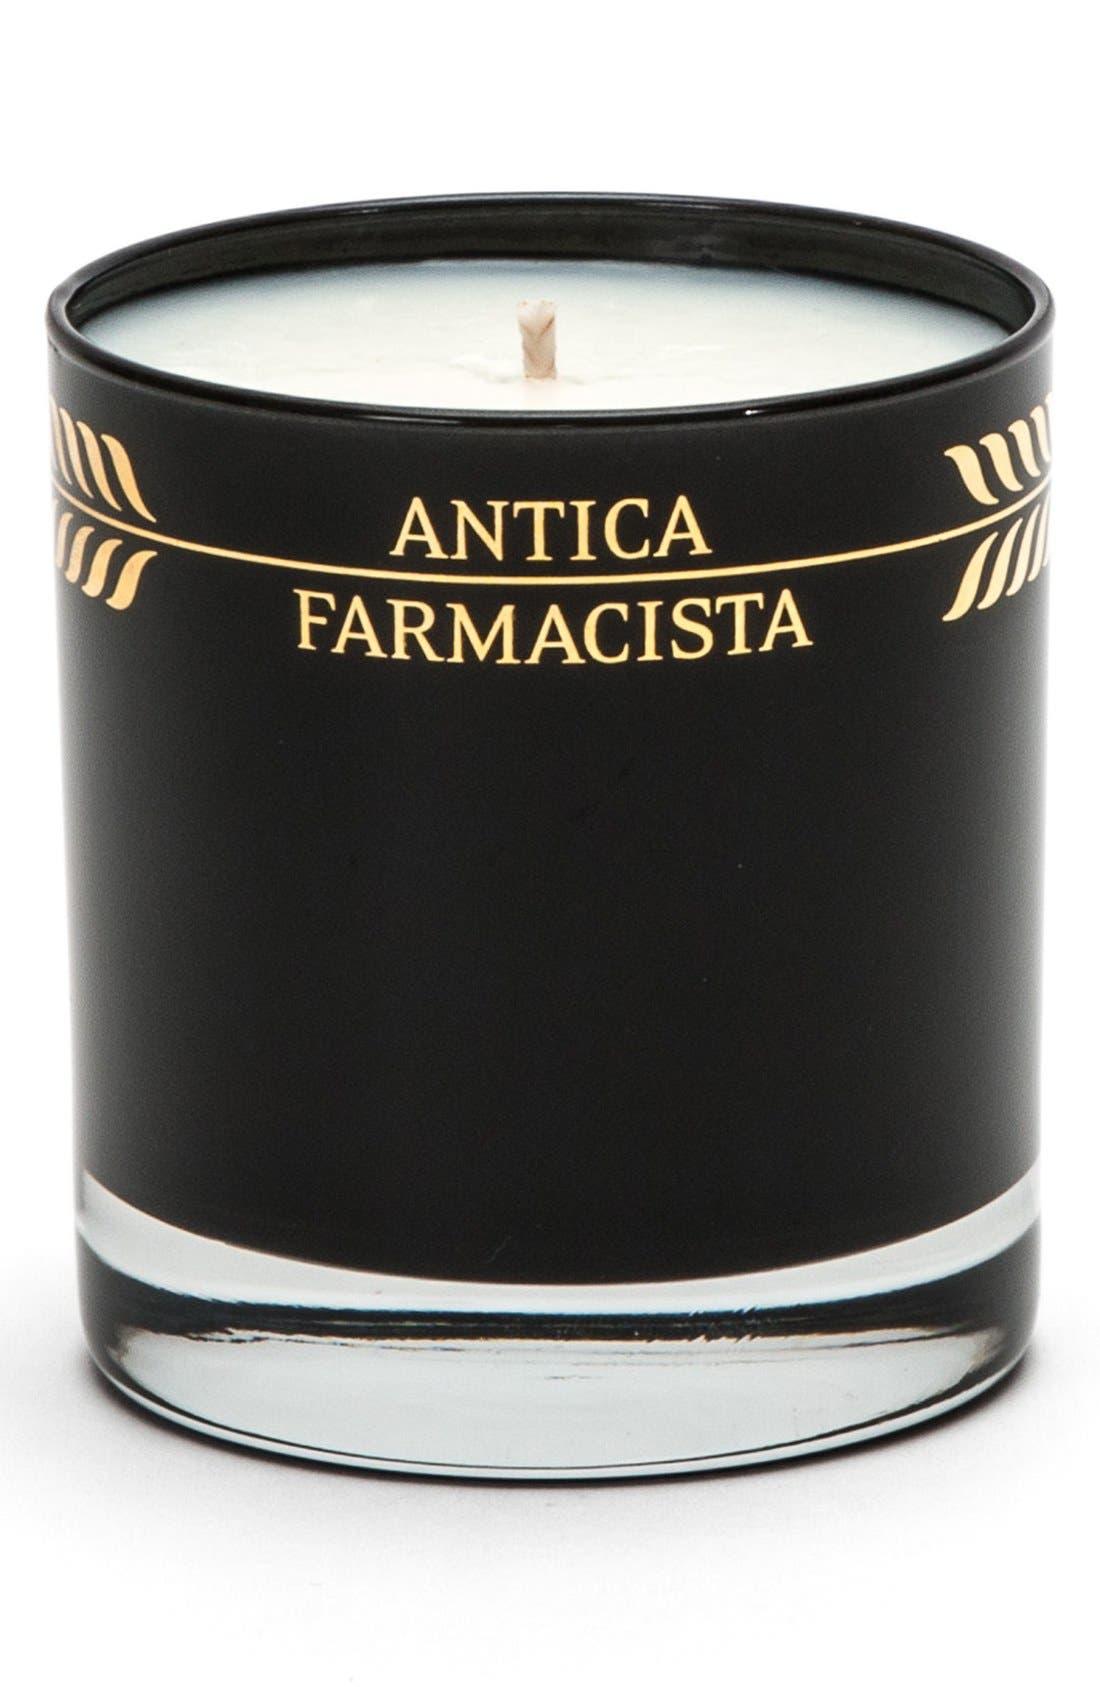 Antica Farmacista 'Black Label Champagne' Candle (Limited Edition)